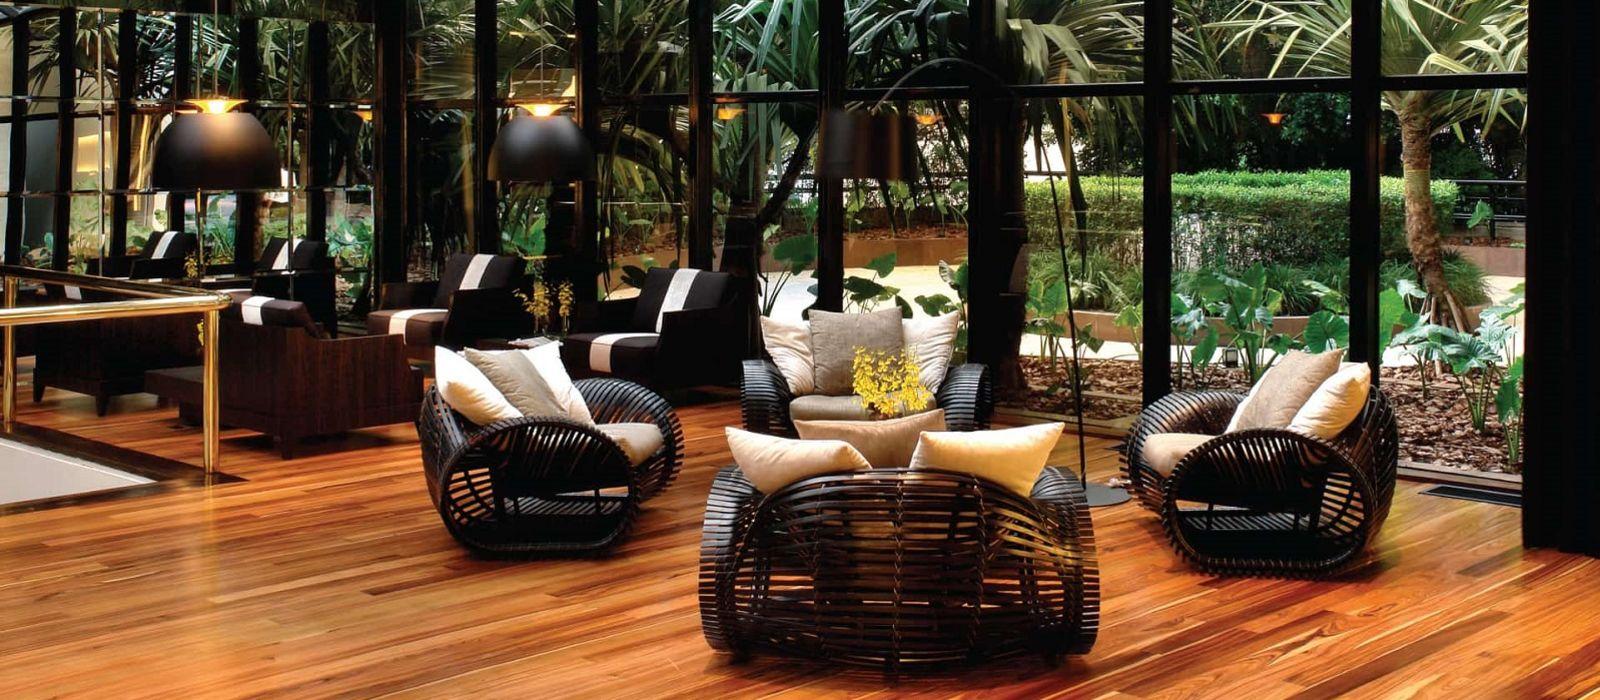 Hotel Tivoli Sao Paulo Mofarrej Brasilien